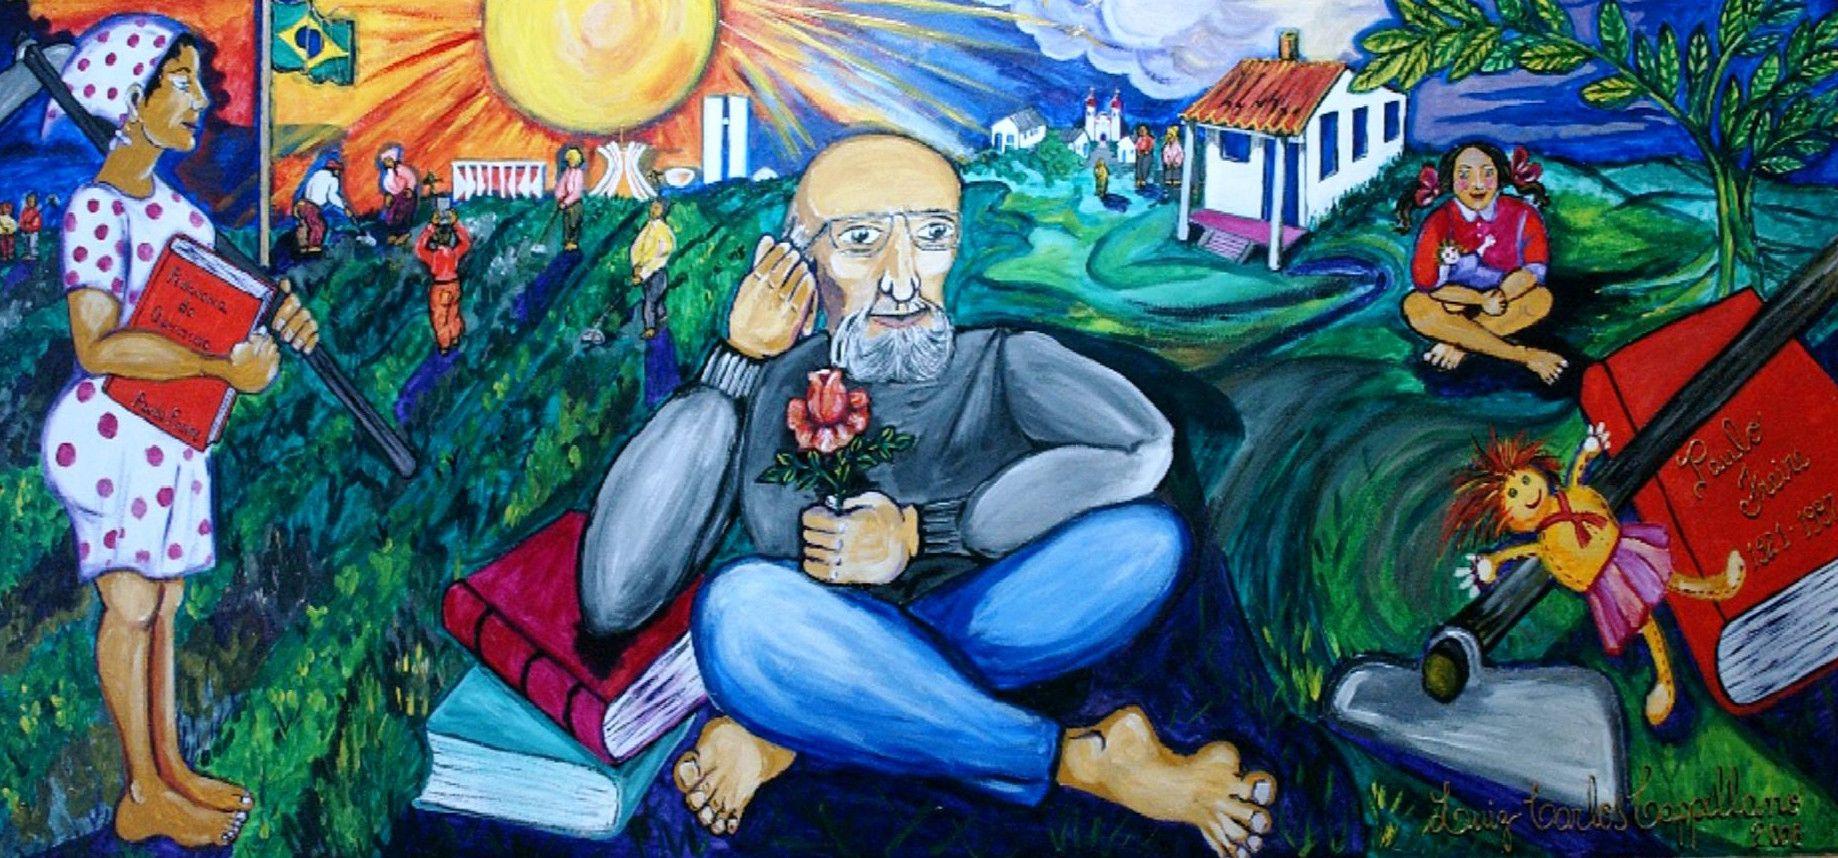 Mural de homenaje a Paulo Freire. Foto: Wikimedia.